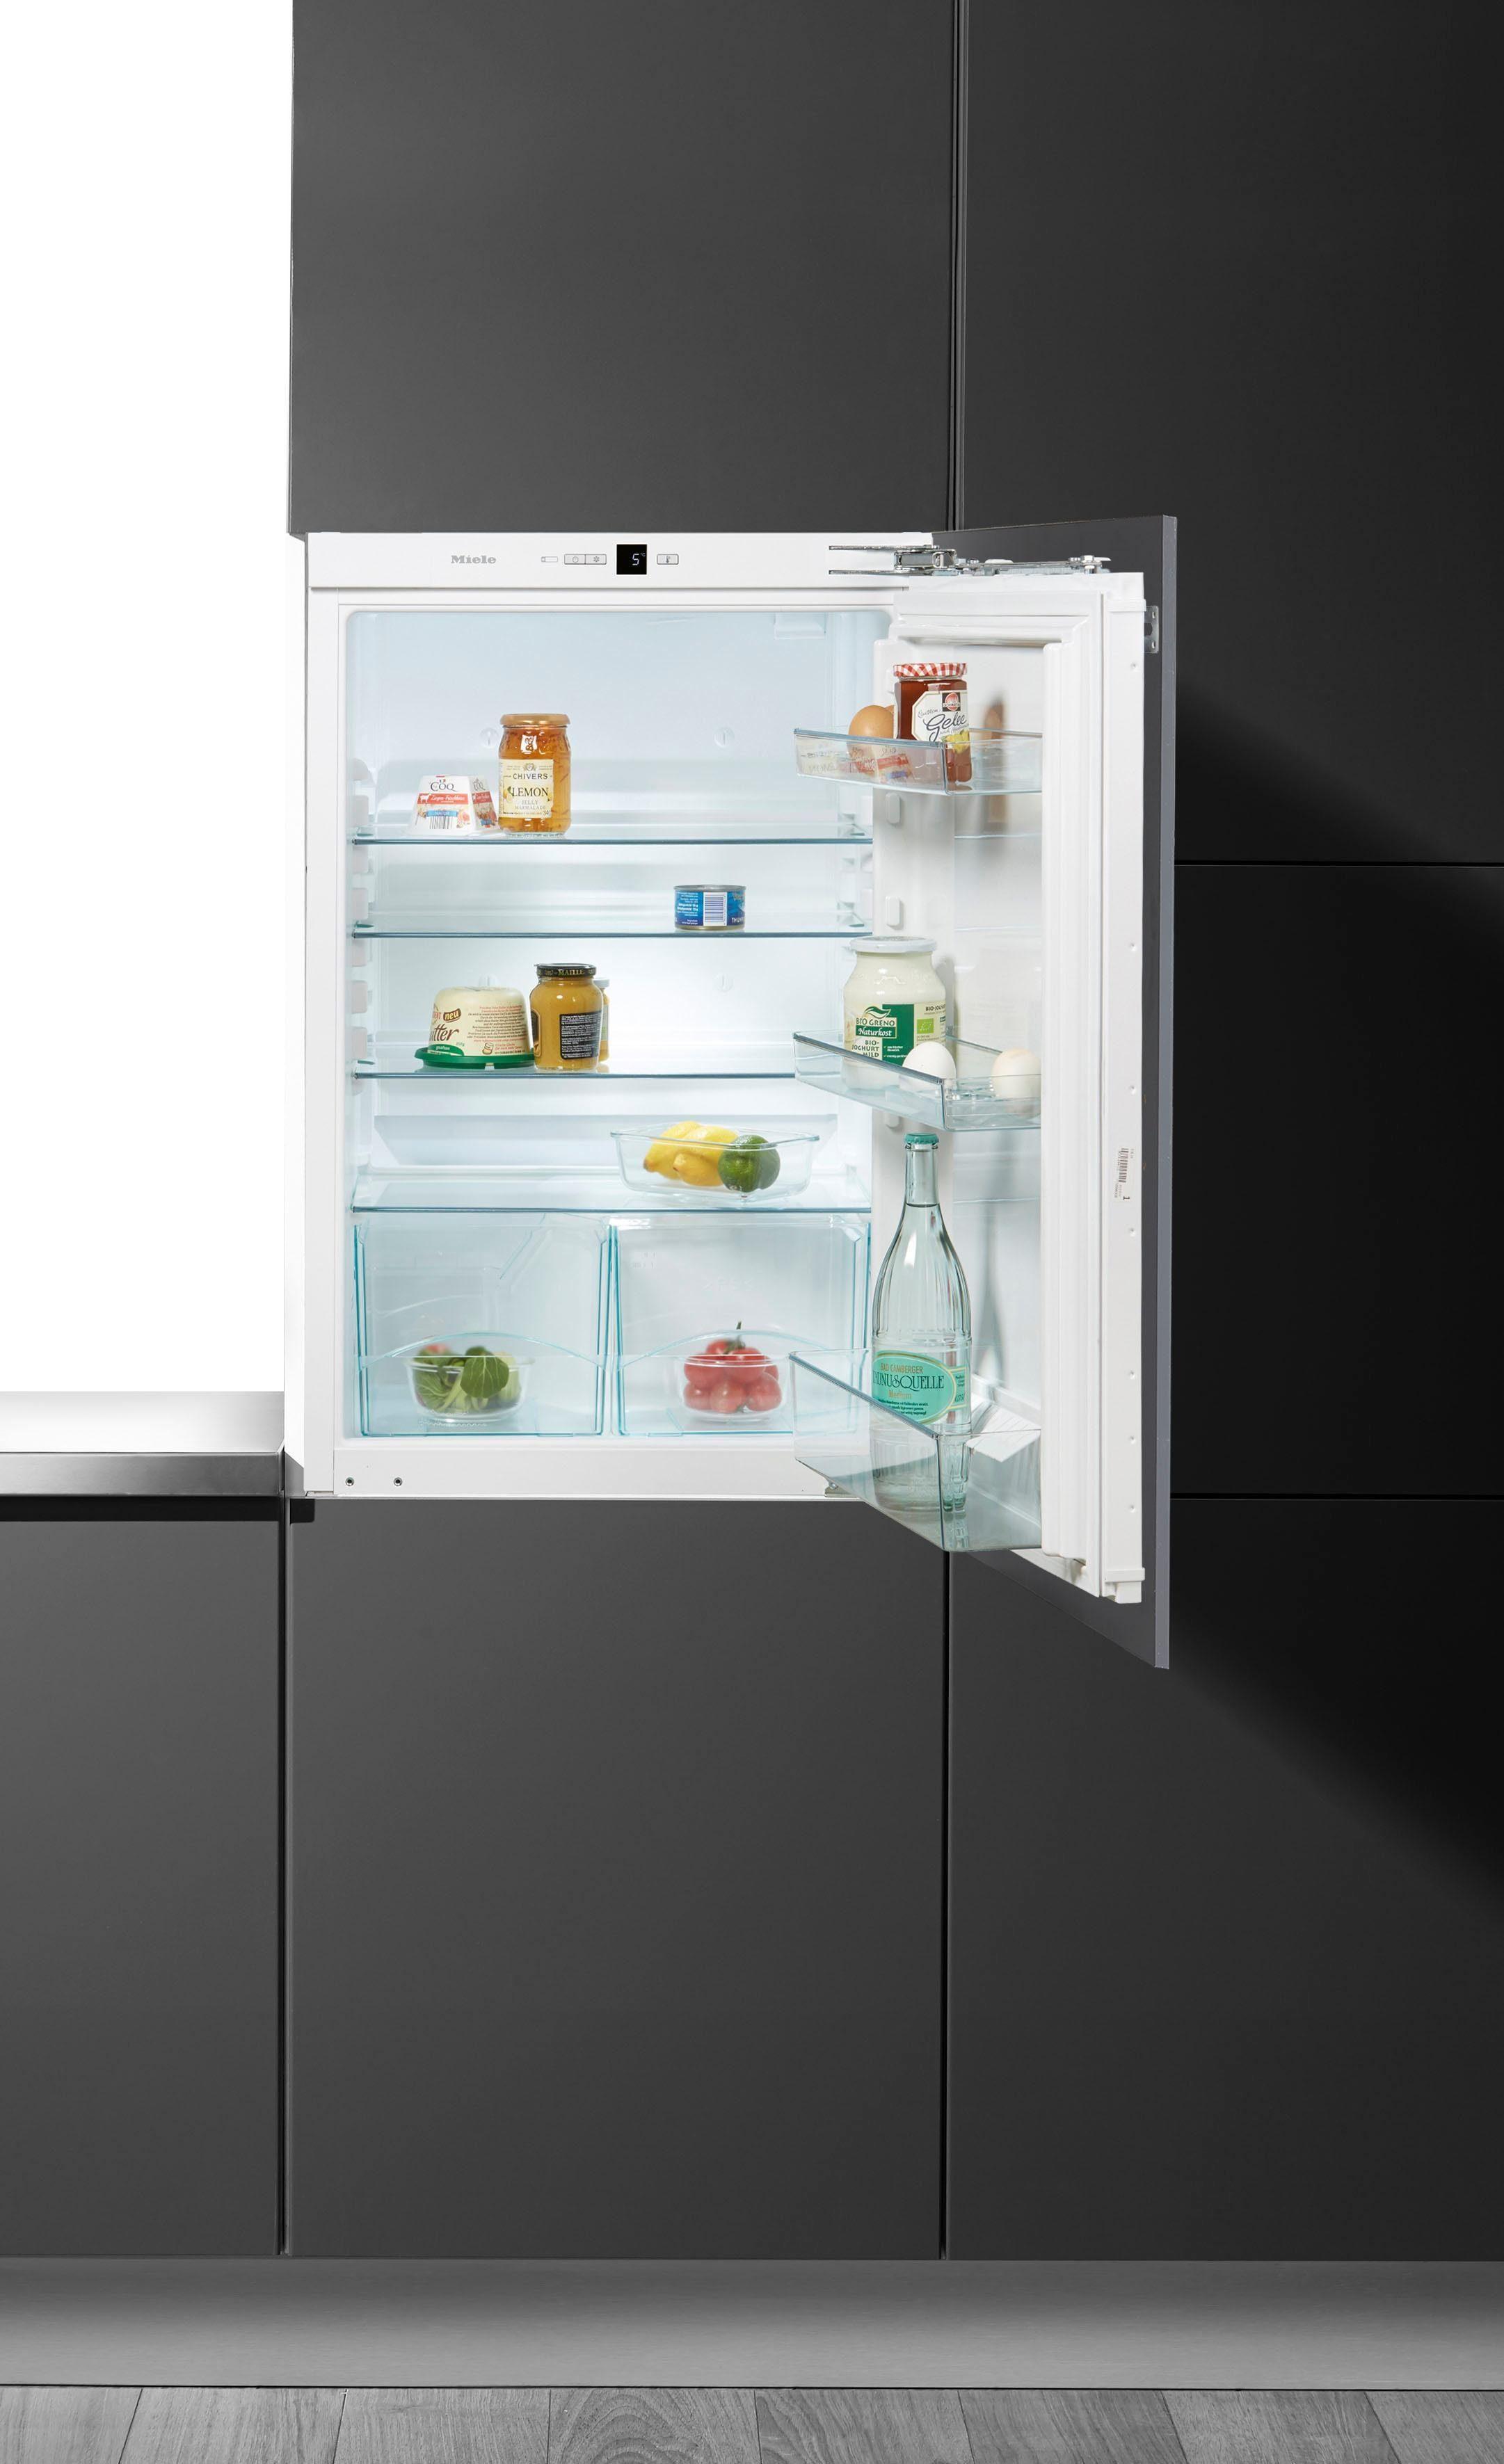 Miele Einbaukühlschrank K 32223 i, 87,2 cm hoch, 55,9 cm breit